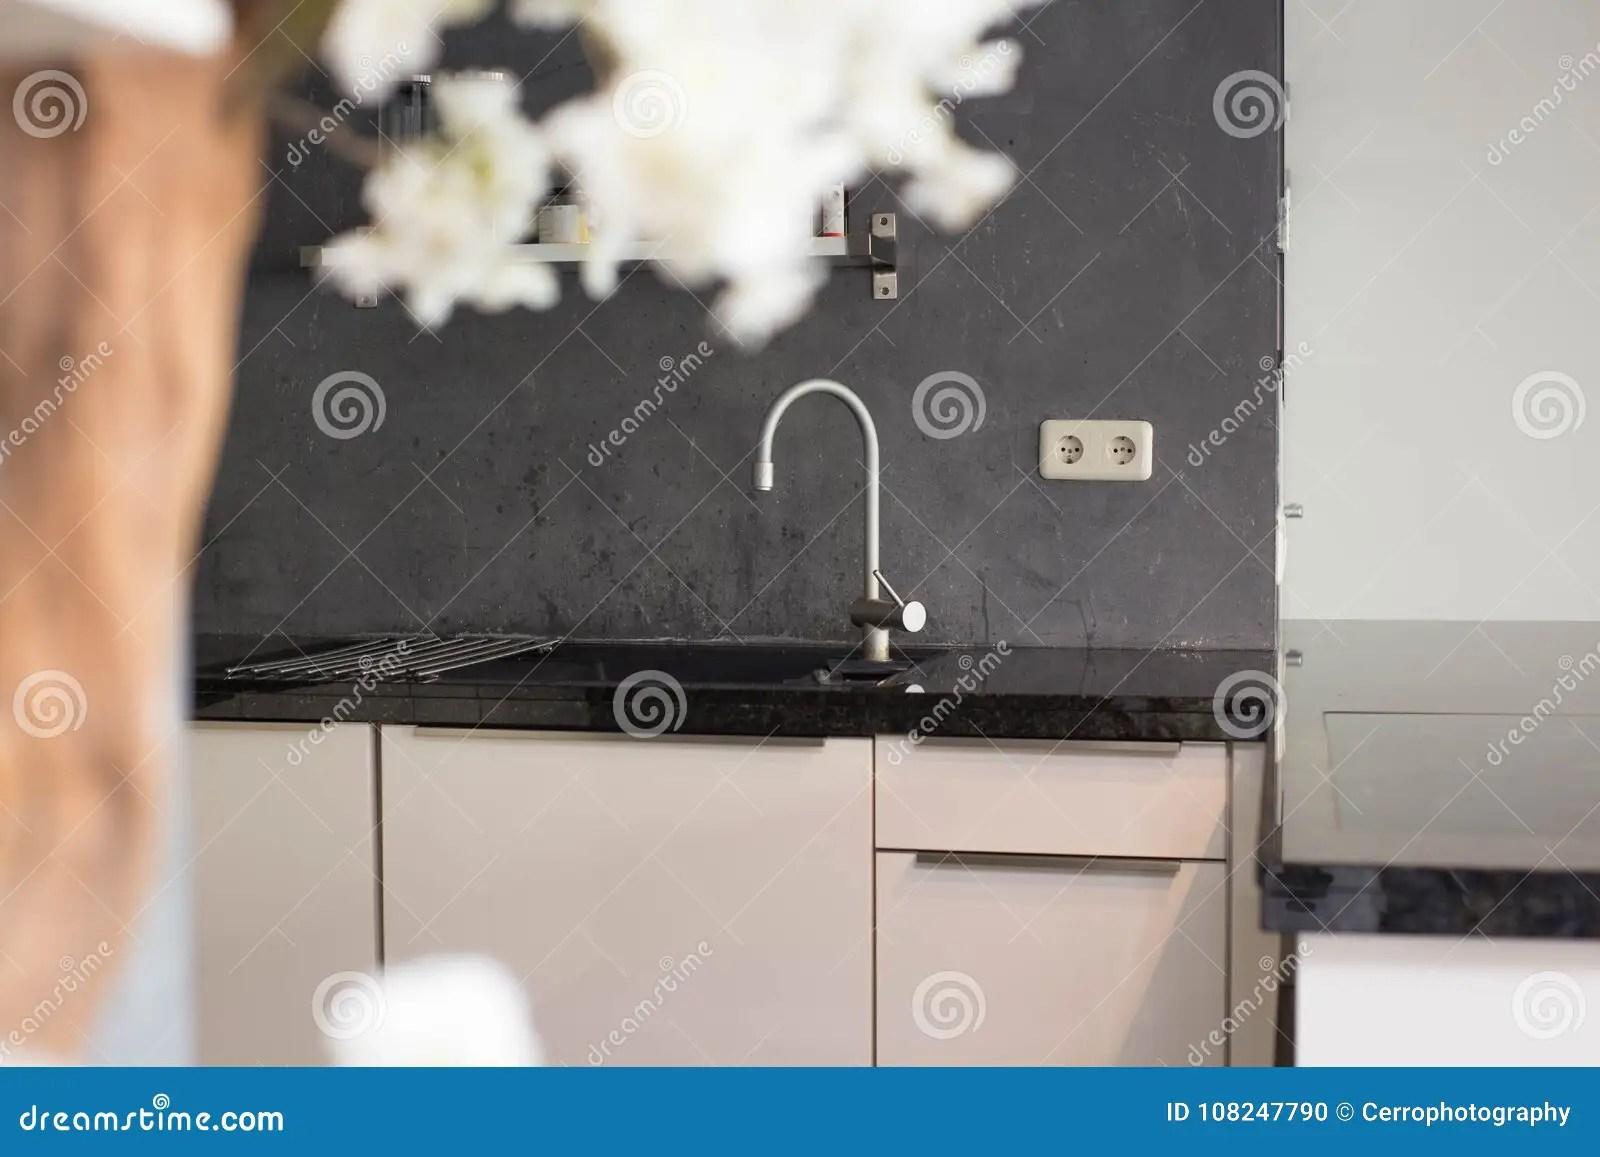 gray kitchen sink laminate floors in 与灰色墙壁的新的厨房水槽现代设计库存照片 图片包括有高雅 投反对票 与灰色walll的新的厨房水槽现代设计和银轻拍